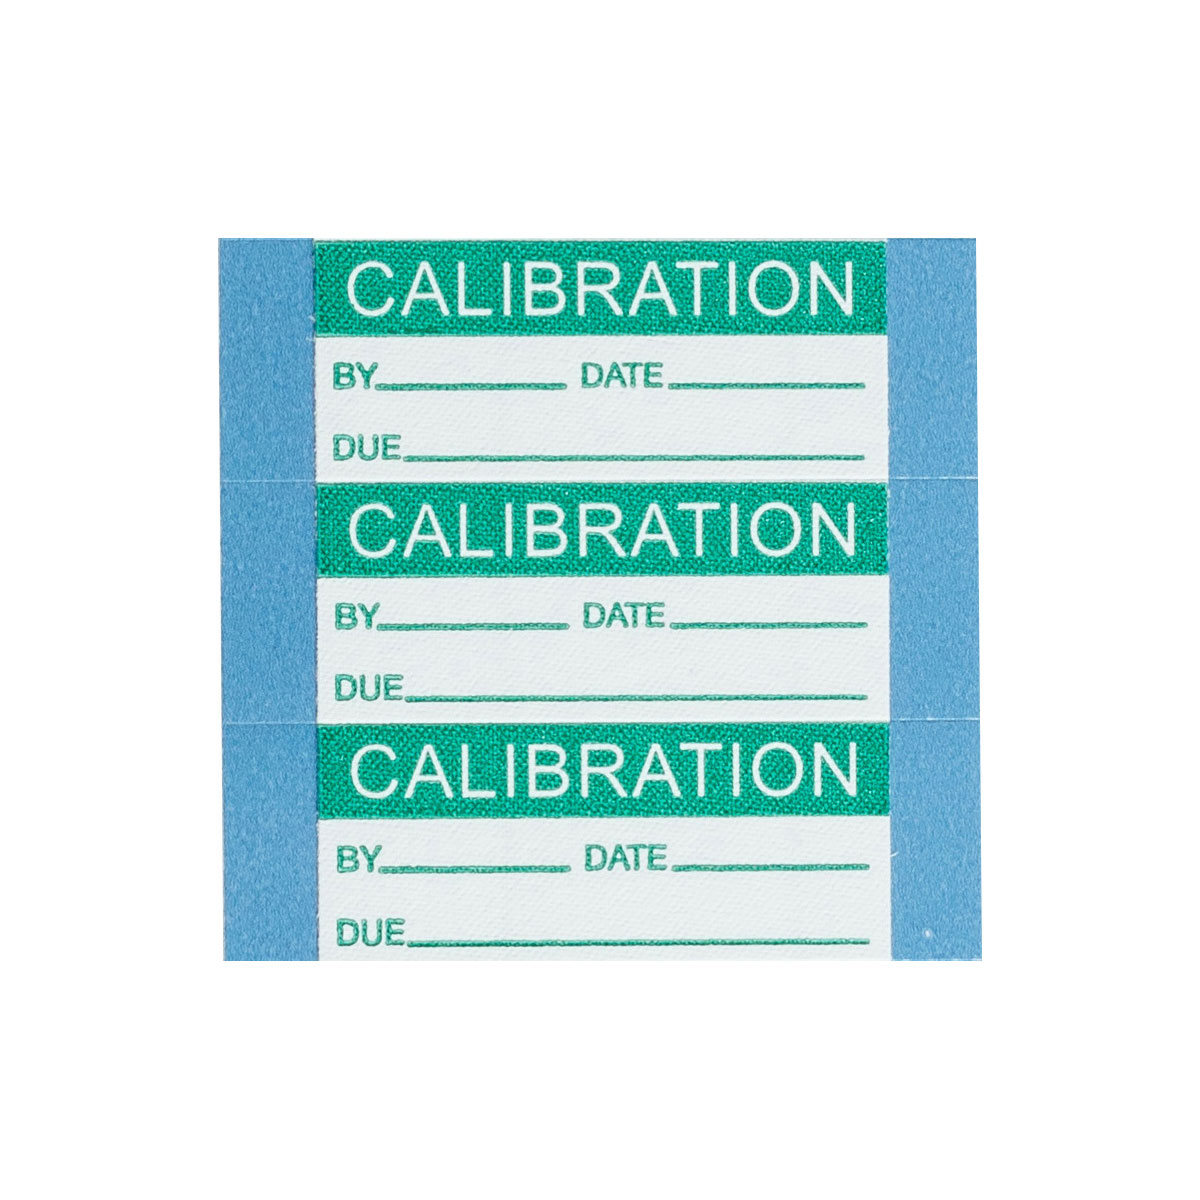 brady part wo 10 calibration labels. Black Bedroom Furniture Sets. Home Design Ideas